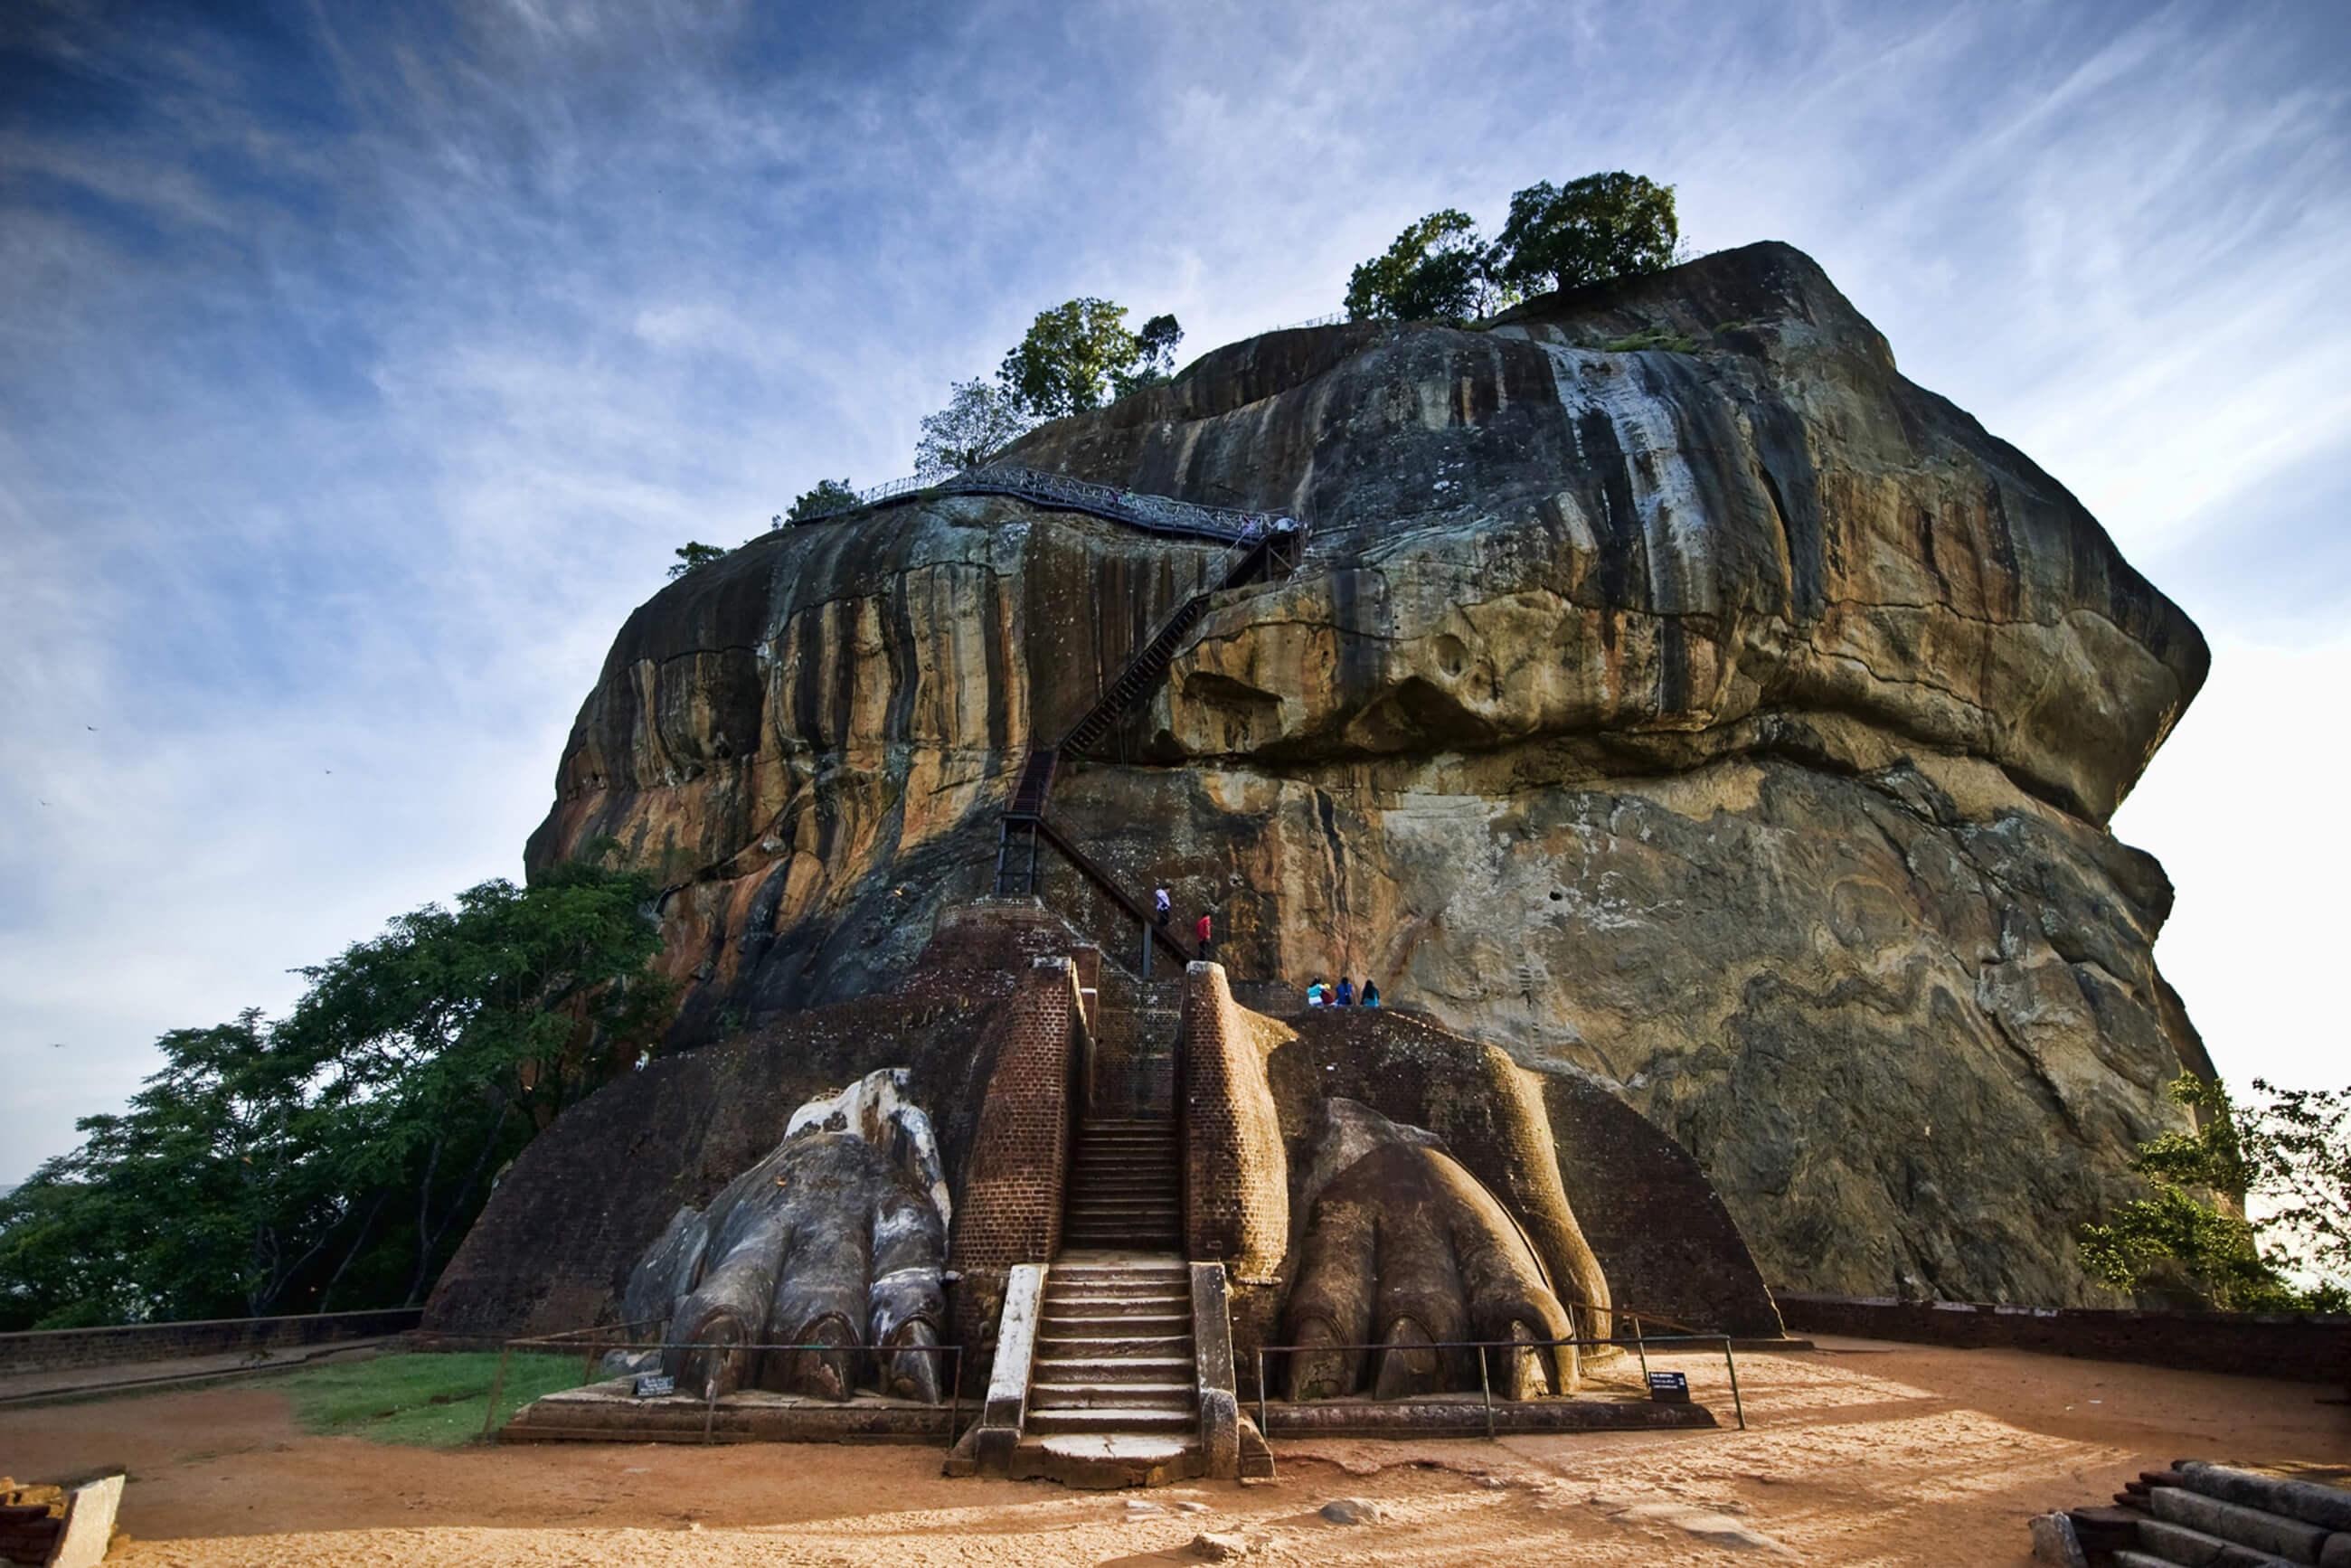 https://bubo.sk/uploads/galleries/5058/archiv_sri-lanka-lion-rock-sigiriya.jpg